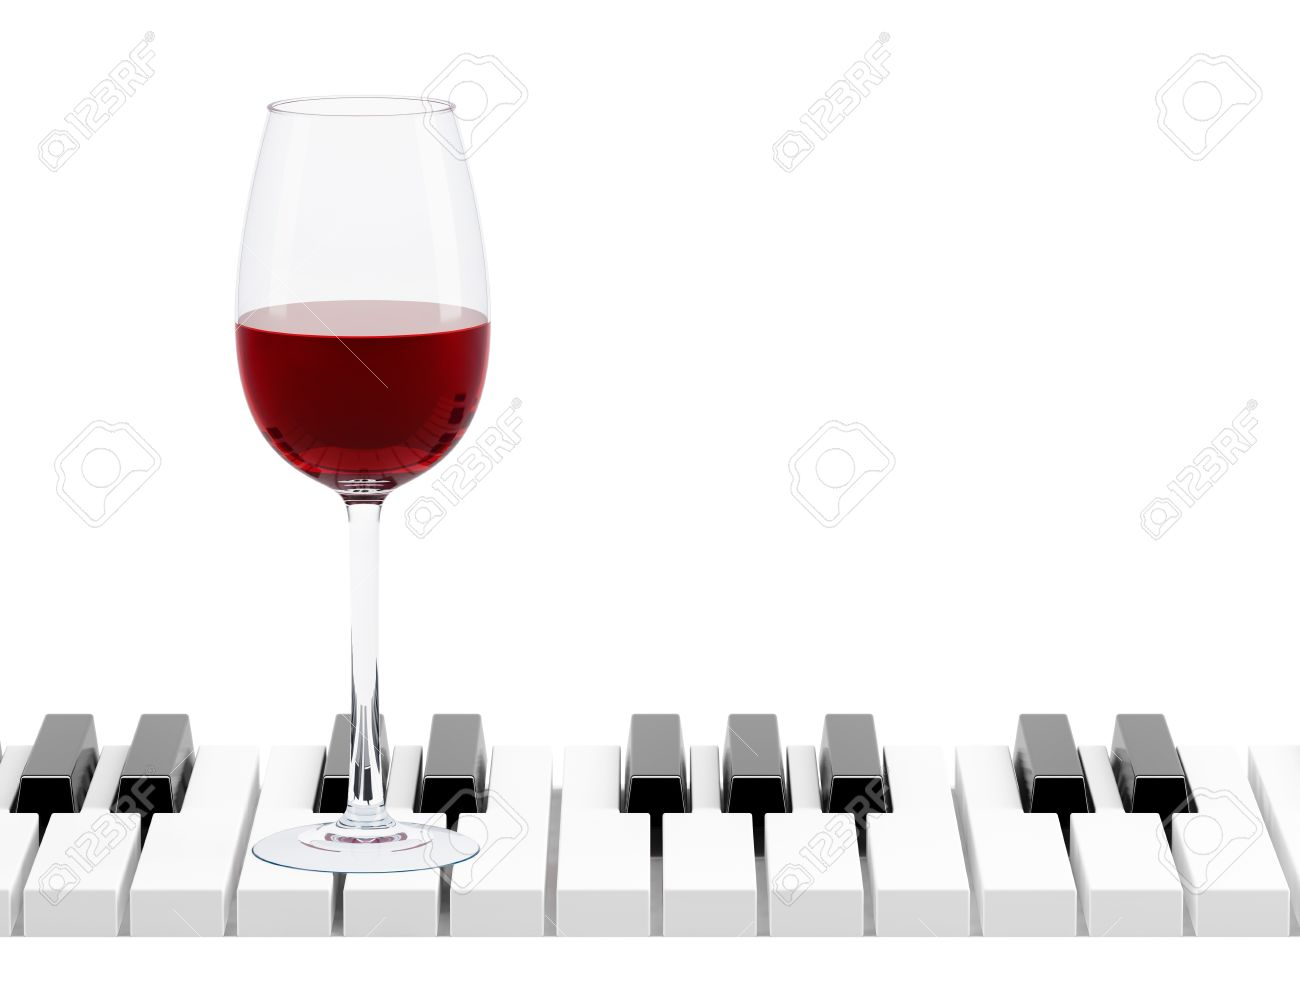 wine glass on piano key on white background Stock Photo - 19390144